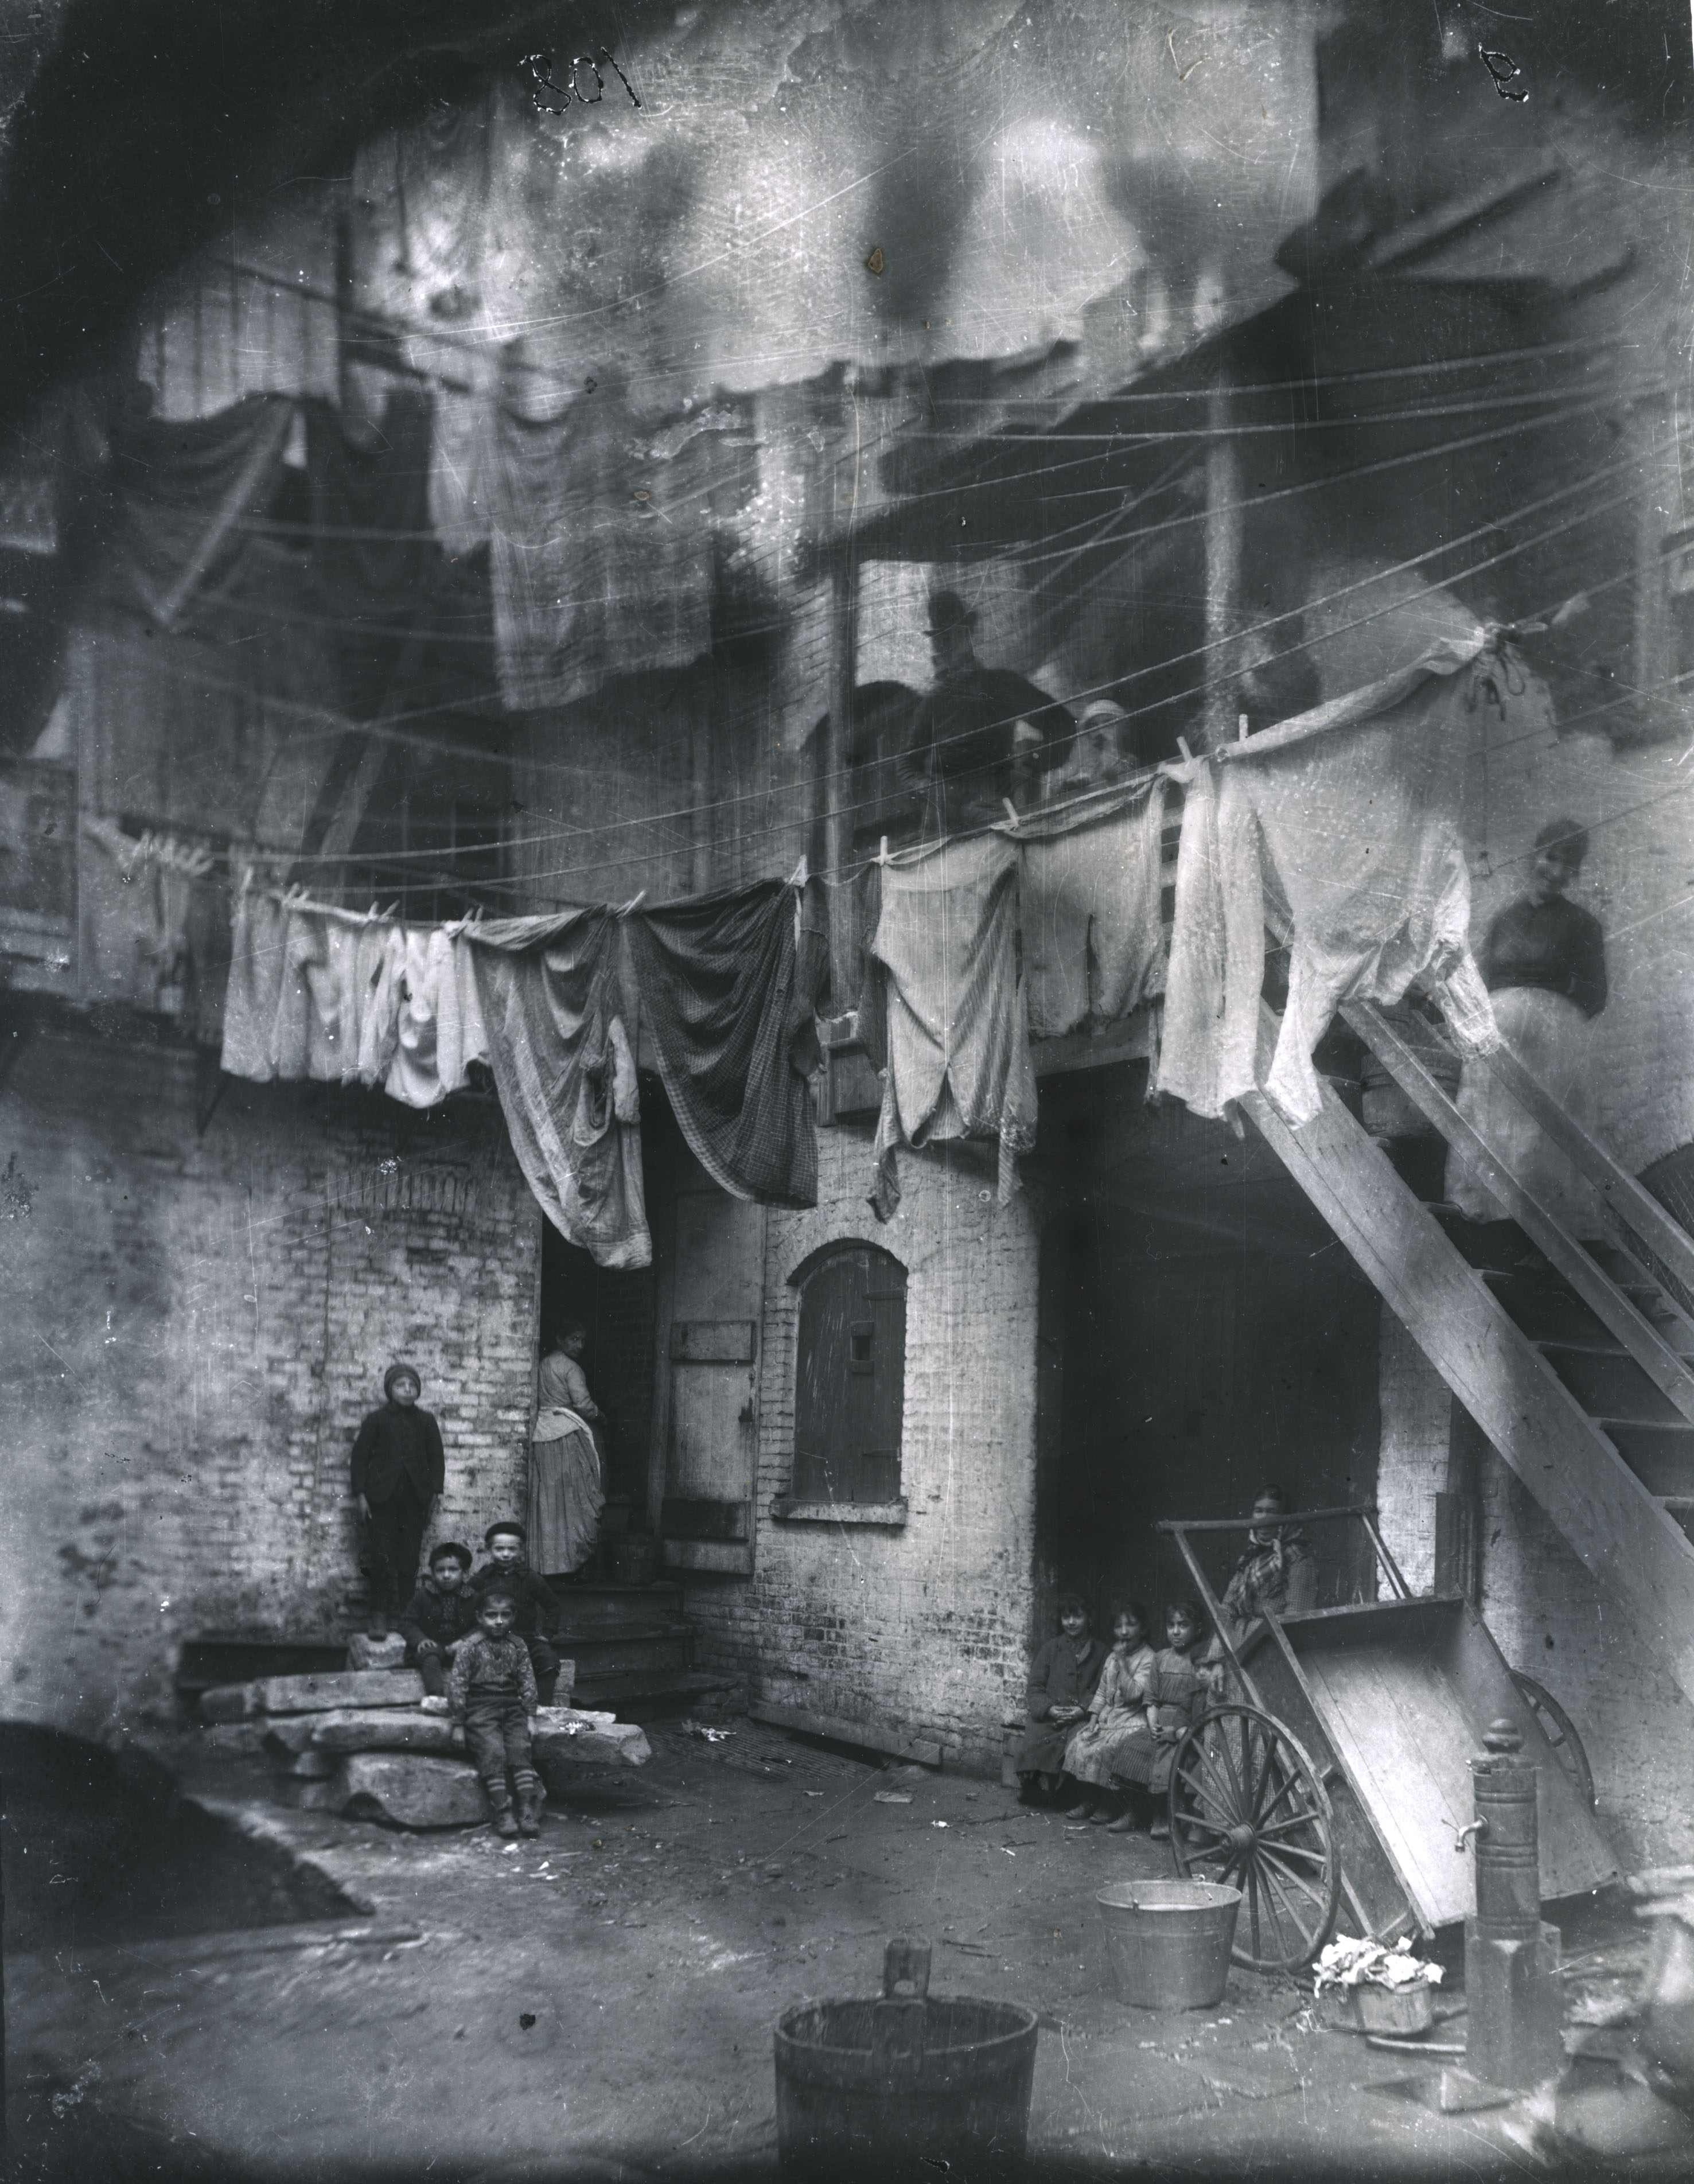 Tenement Yard, How the Other Half Lives. Via Preus Museum